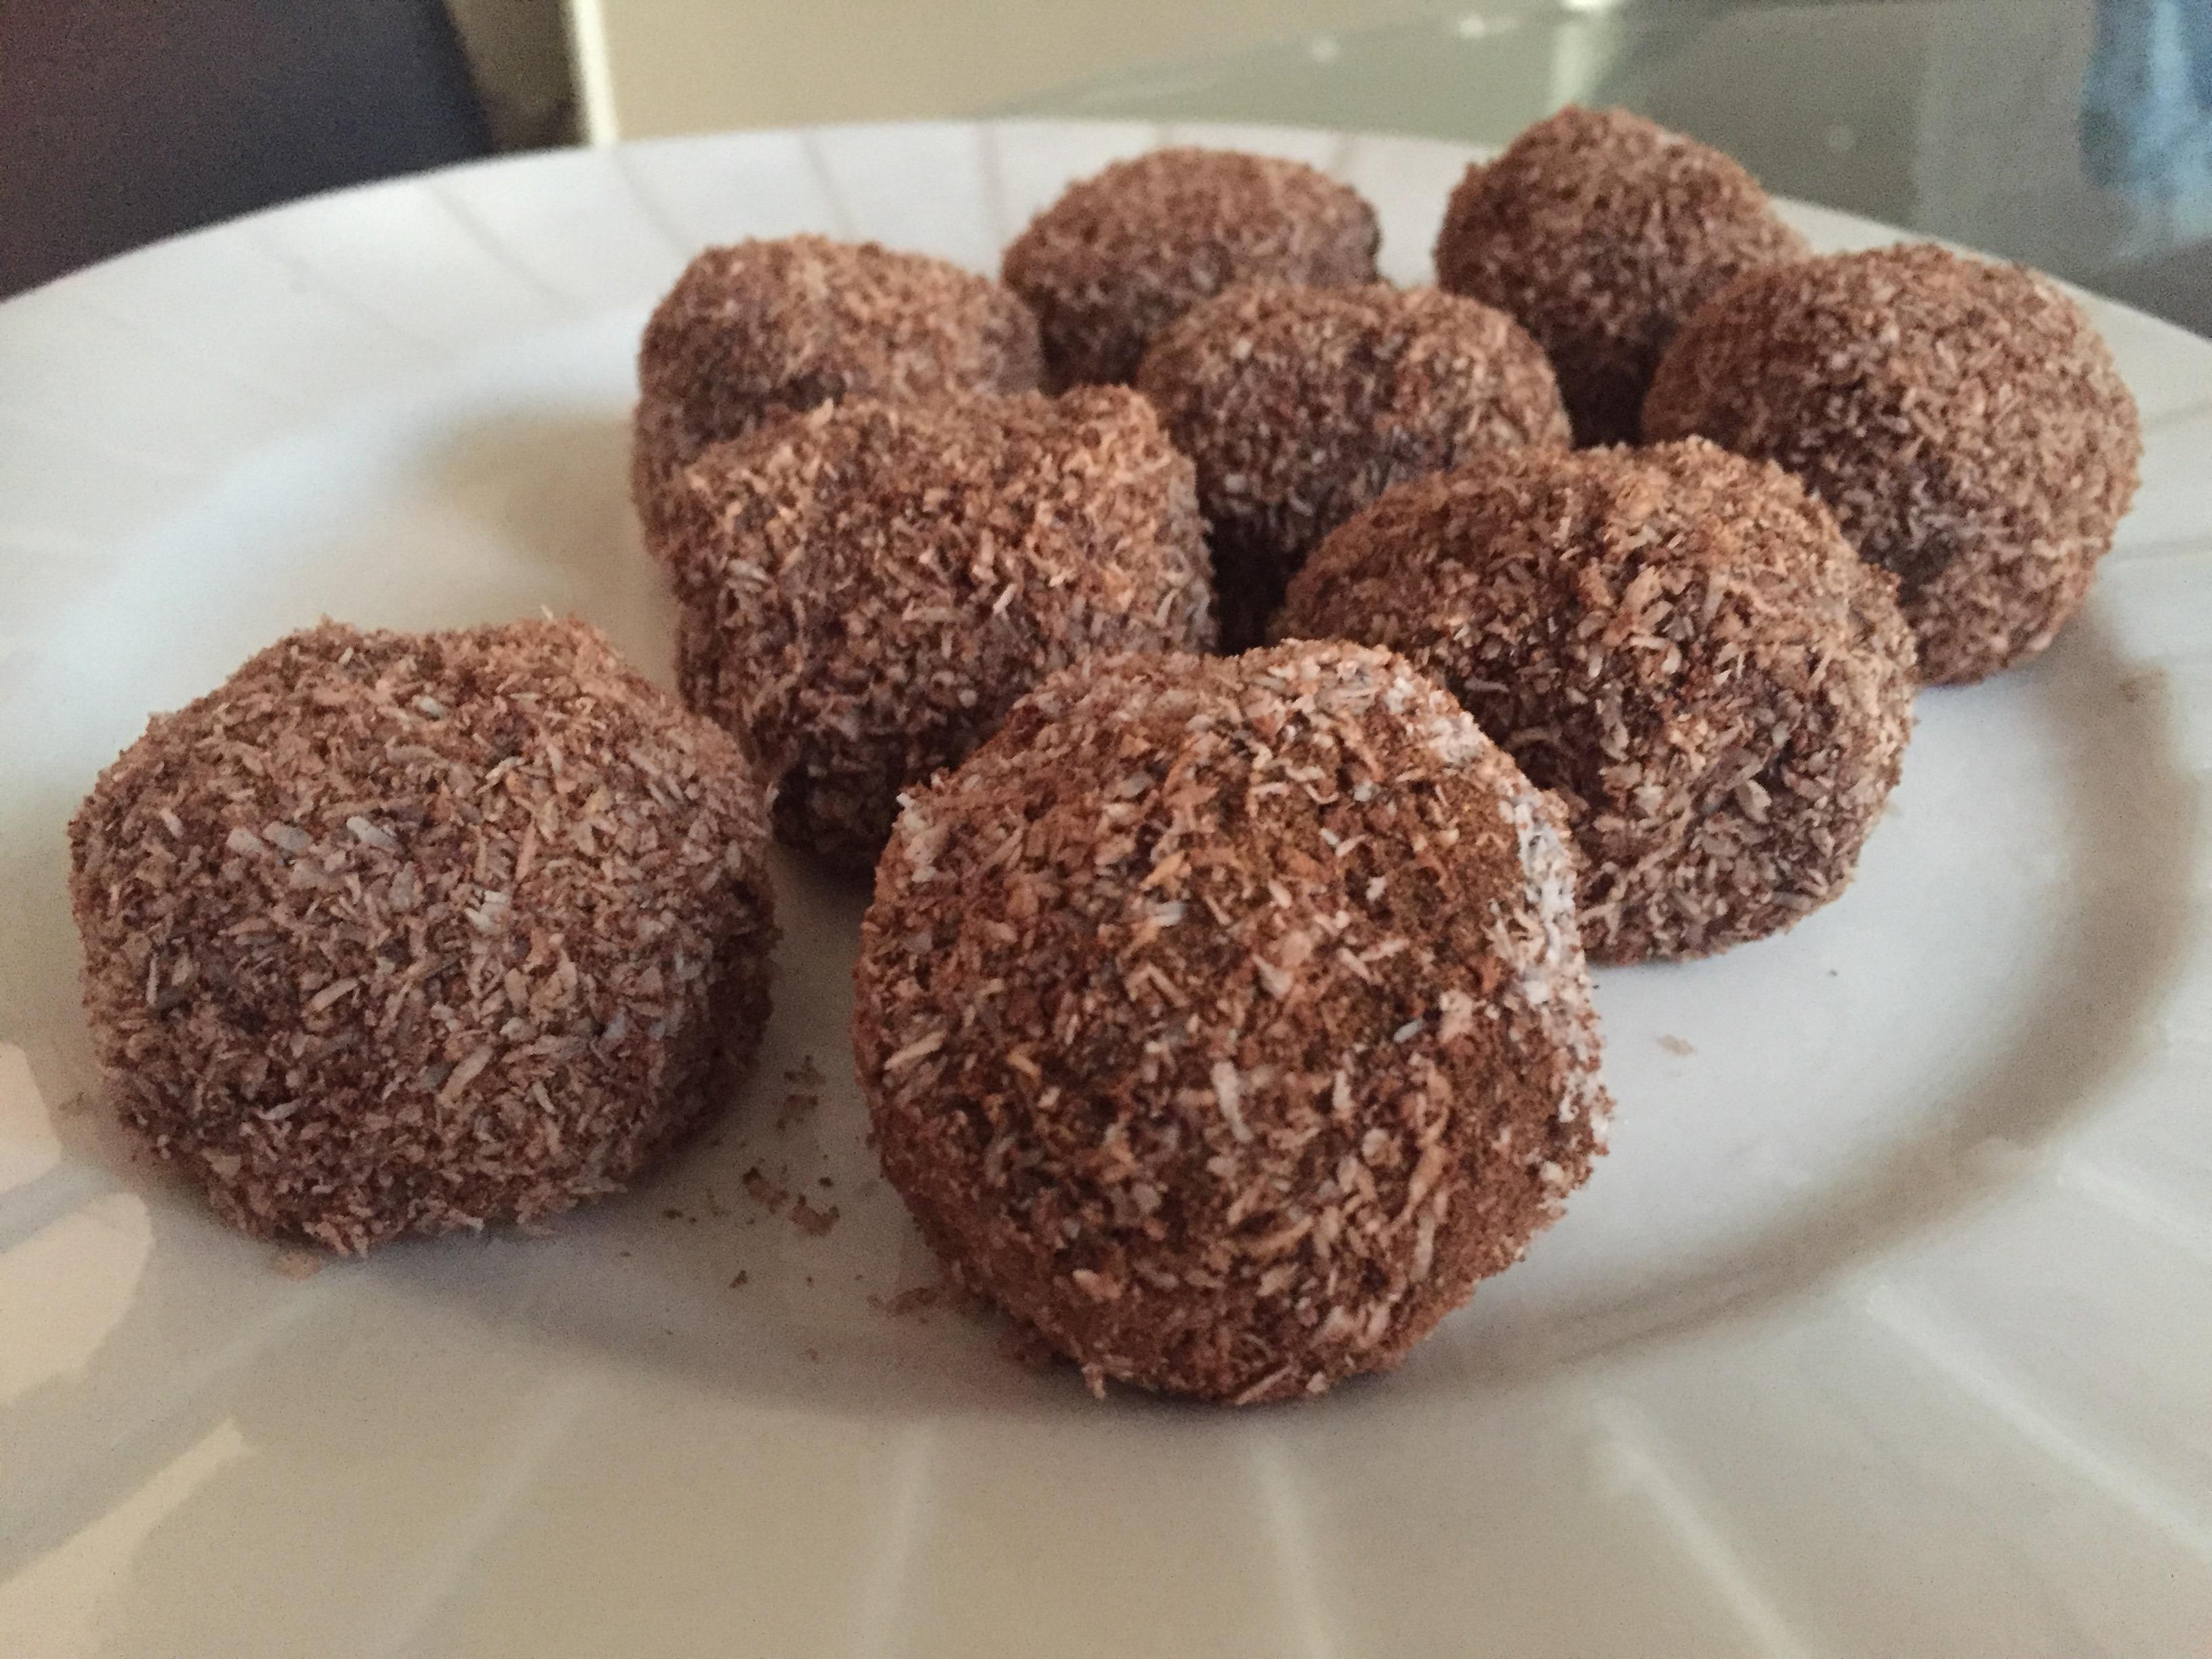 Keto Vegan Healthy Chocolate Truffles